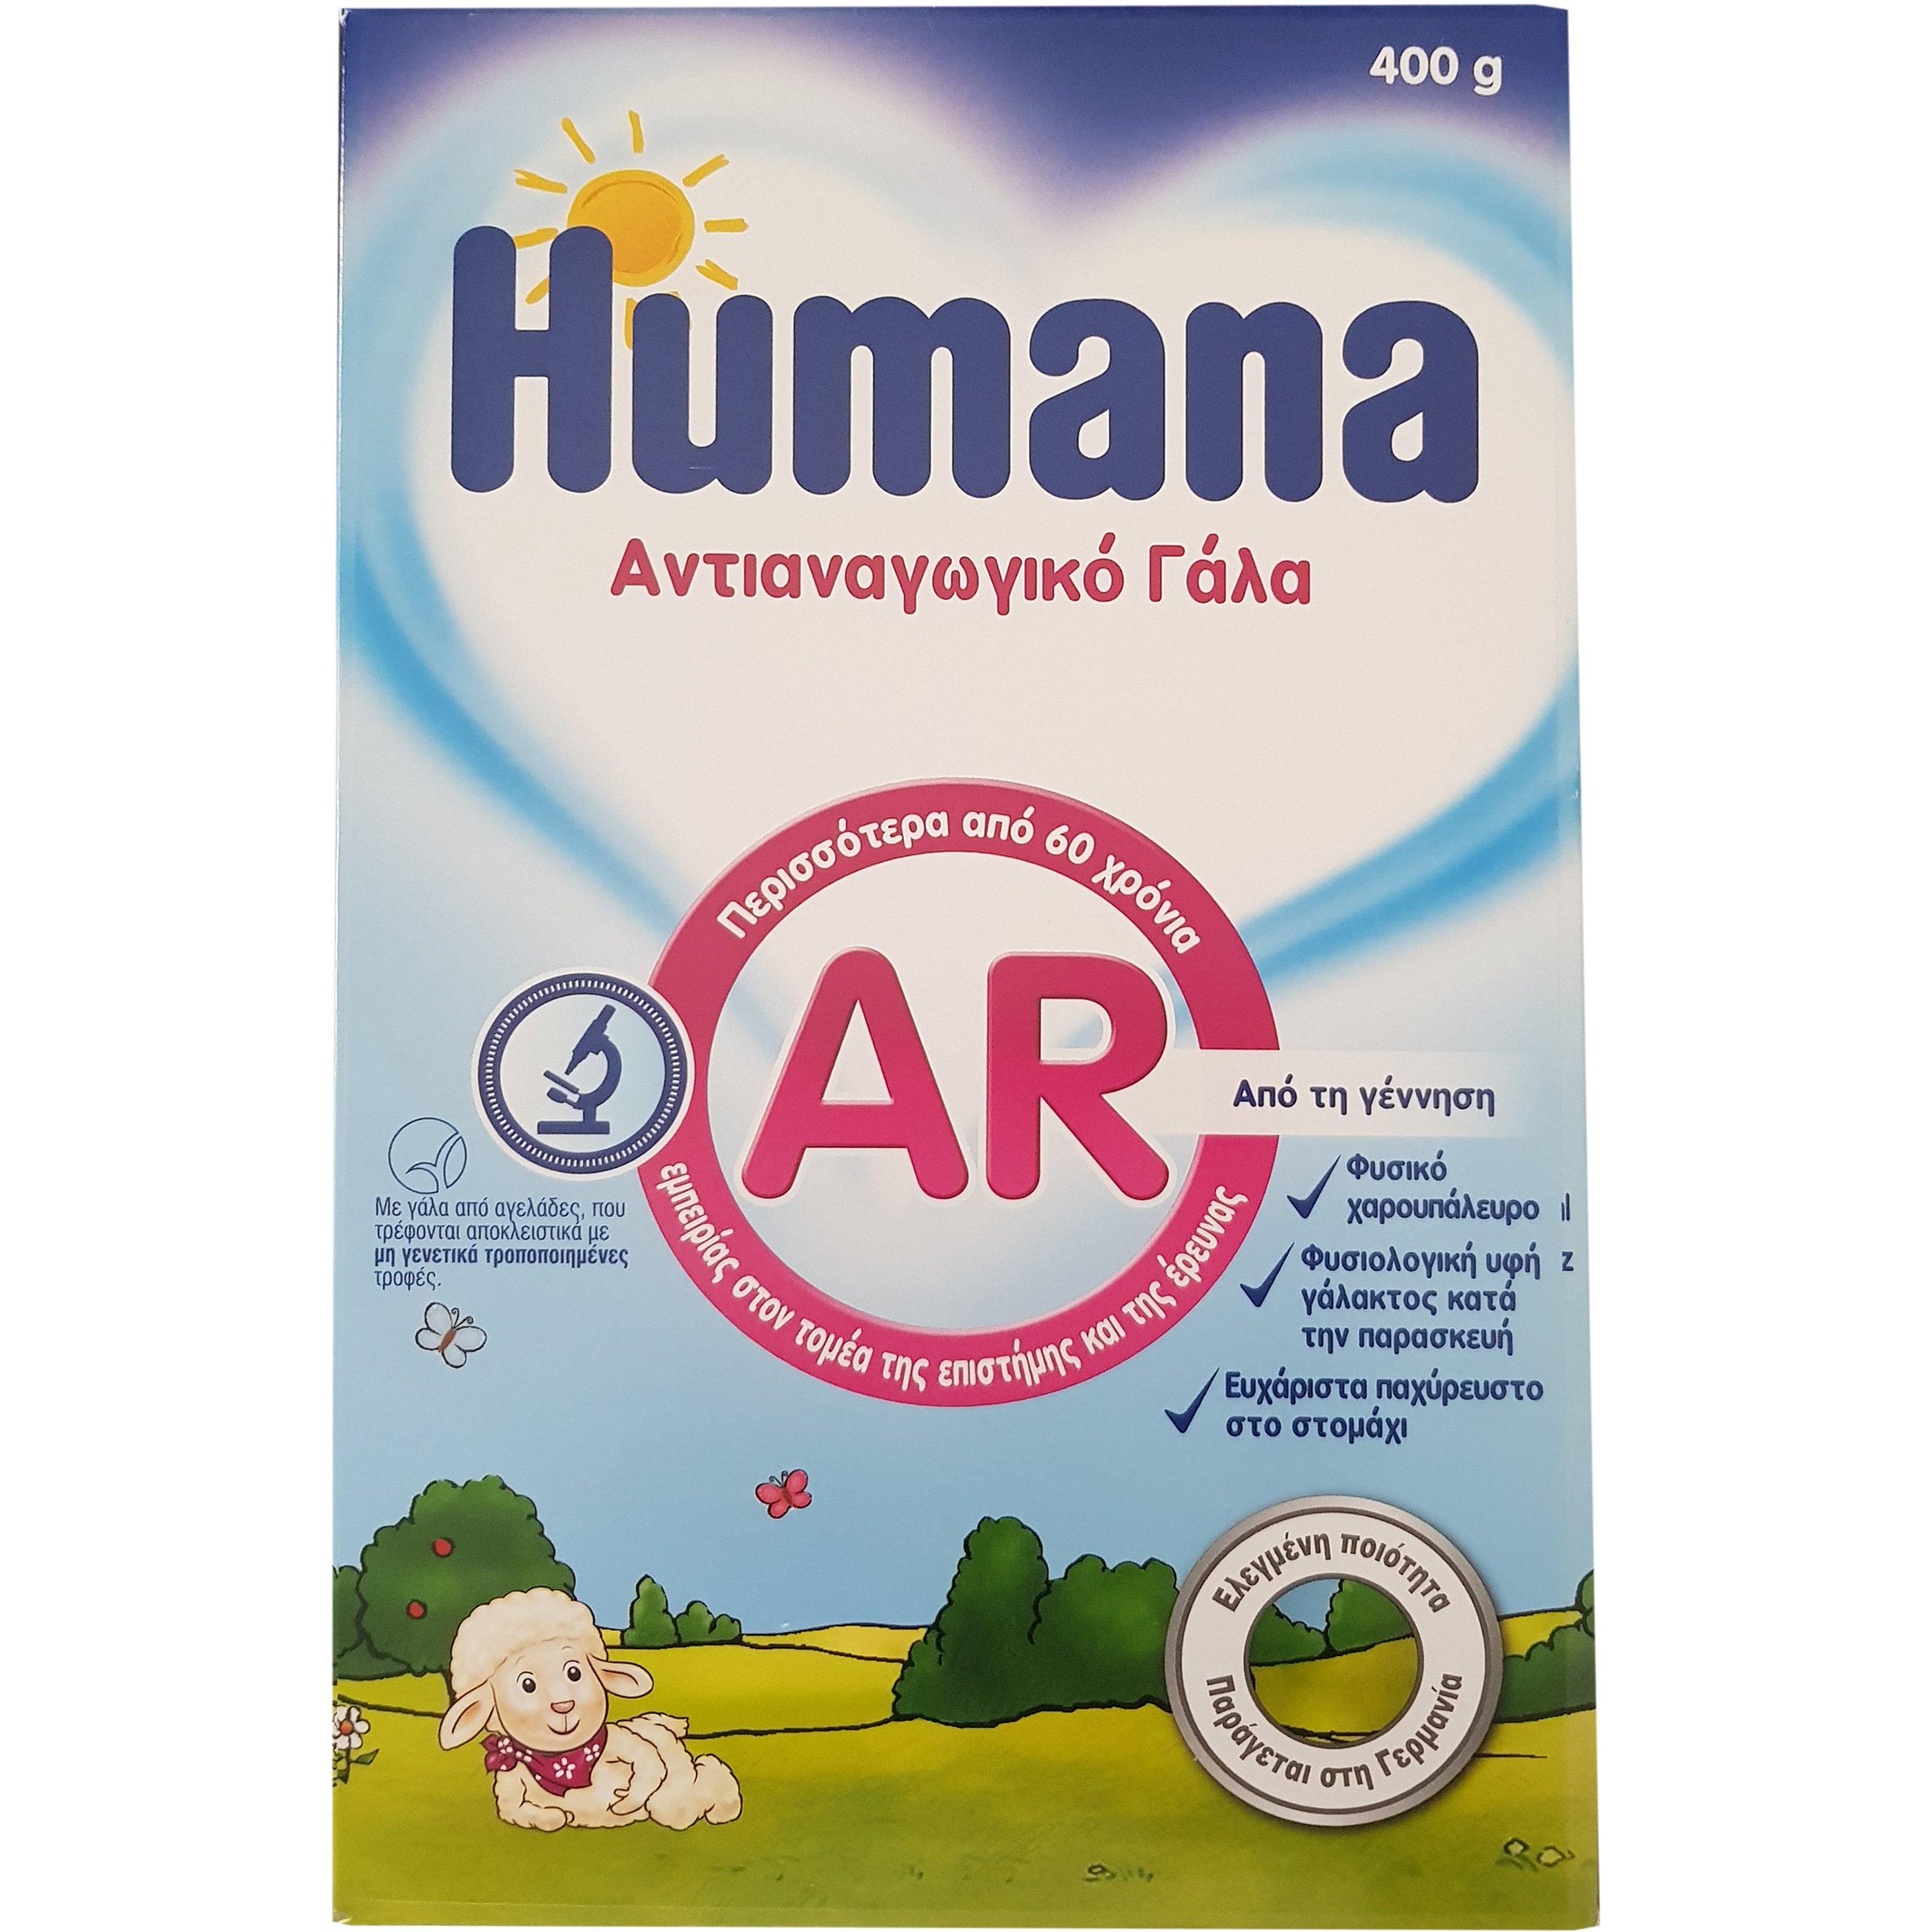 Humana Ar Διαιτητικό Τρόφιμο για Ειδικούς Ιατρικούς Σκοπούς, από την Γέννηση 400gr